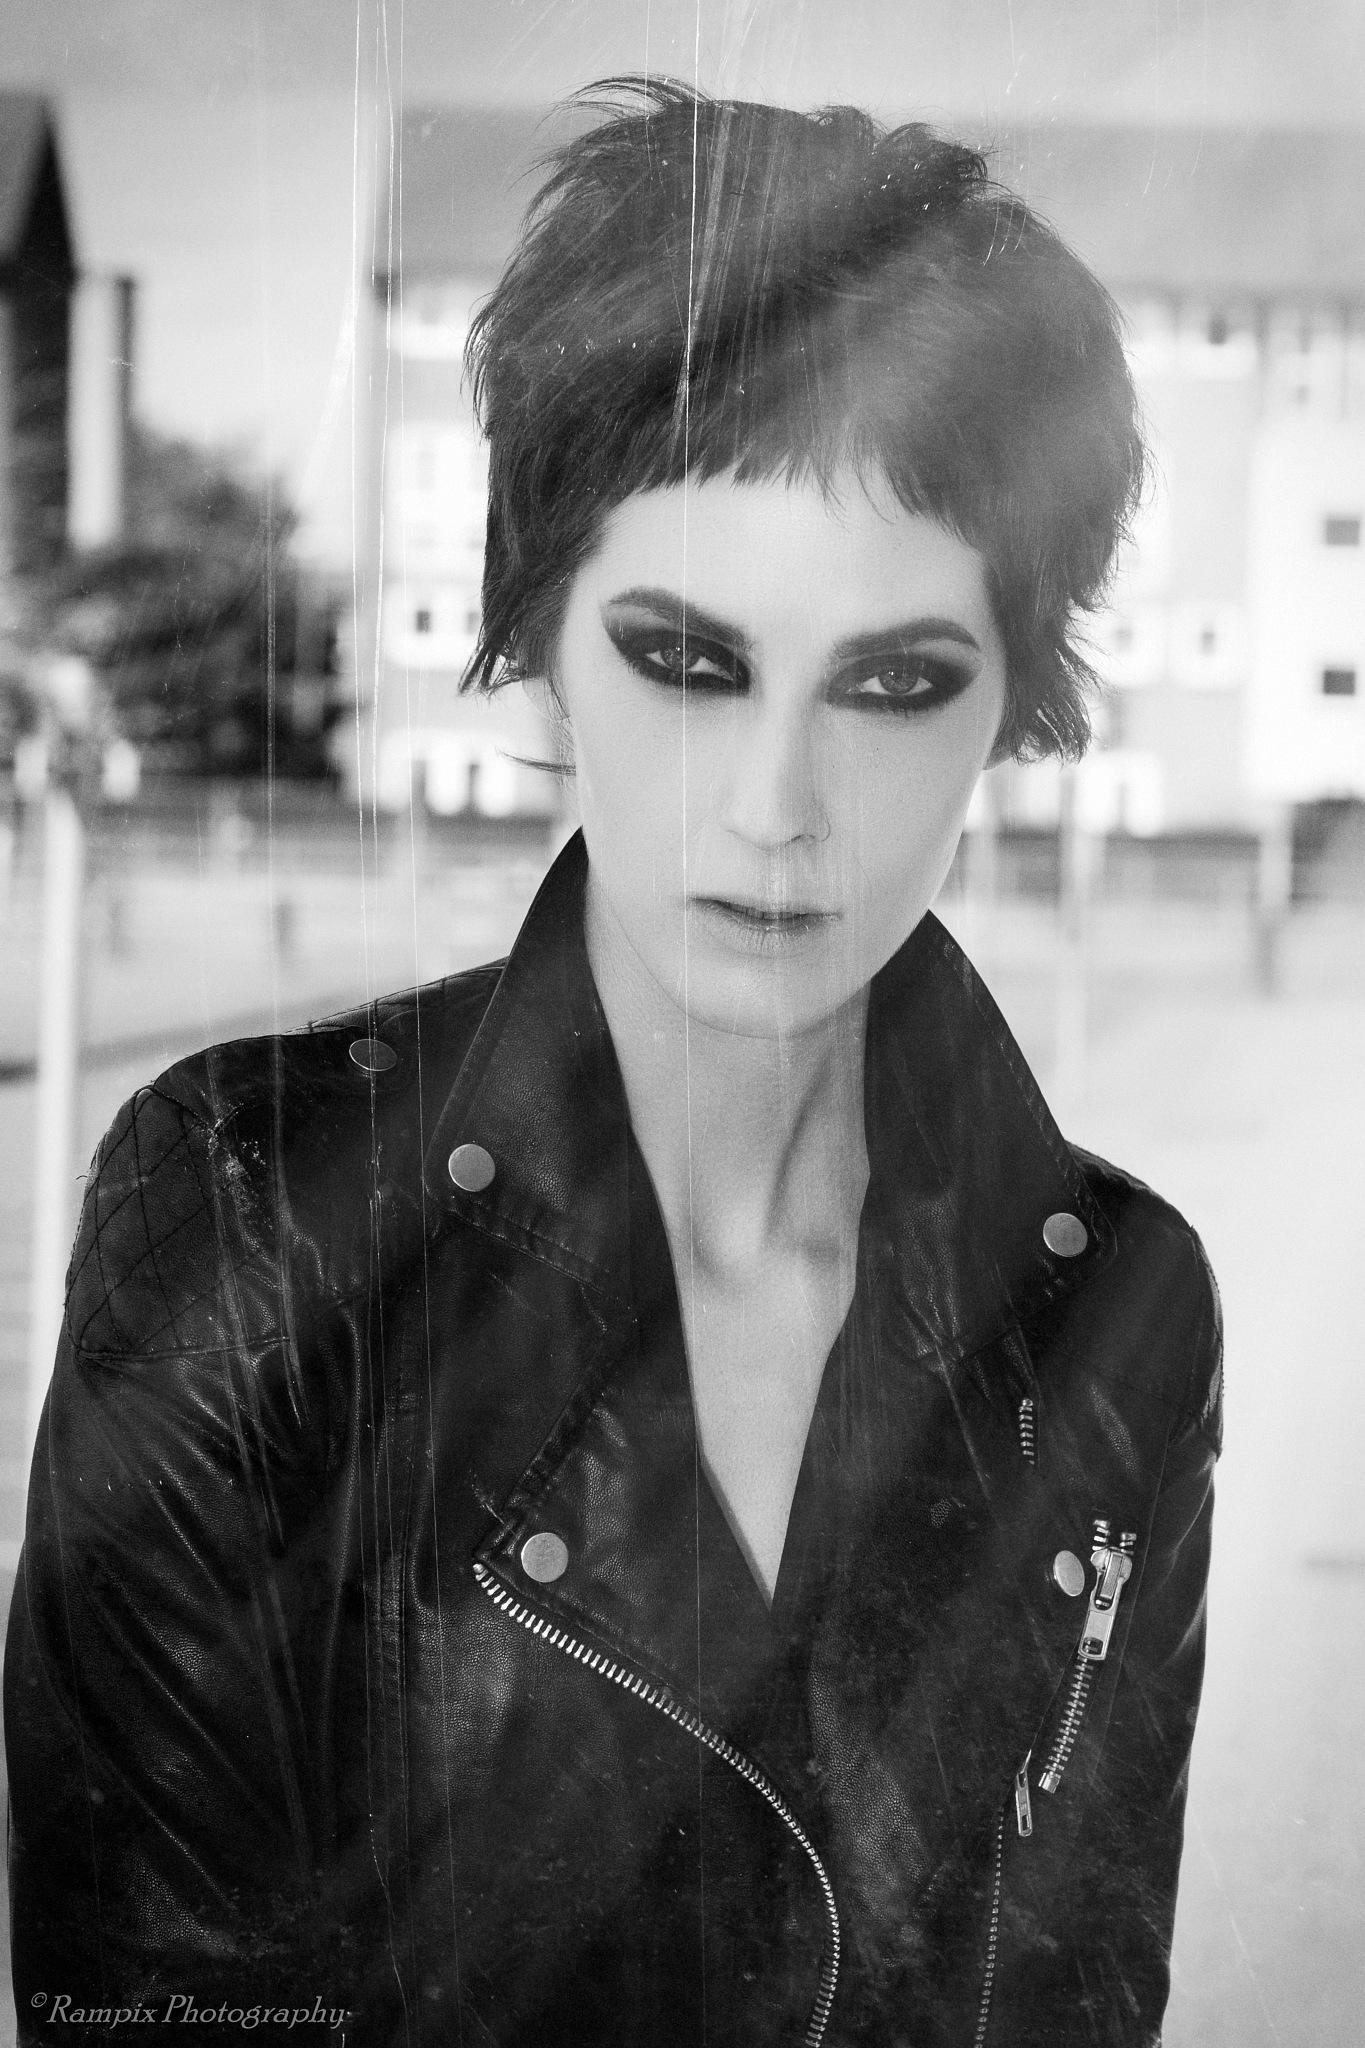 Julie Dumont by Rampix